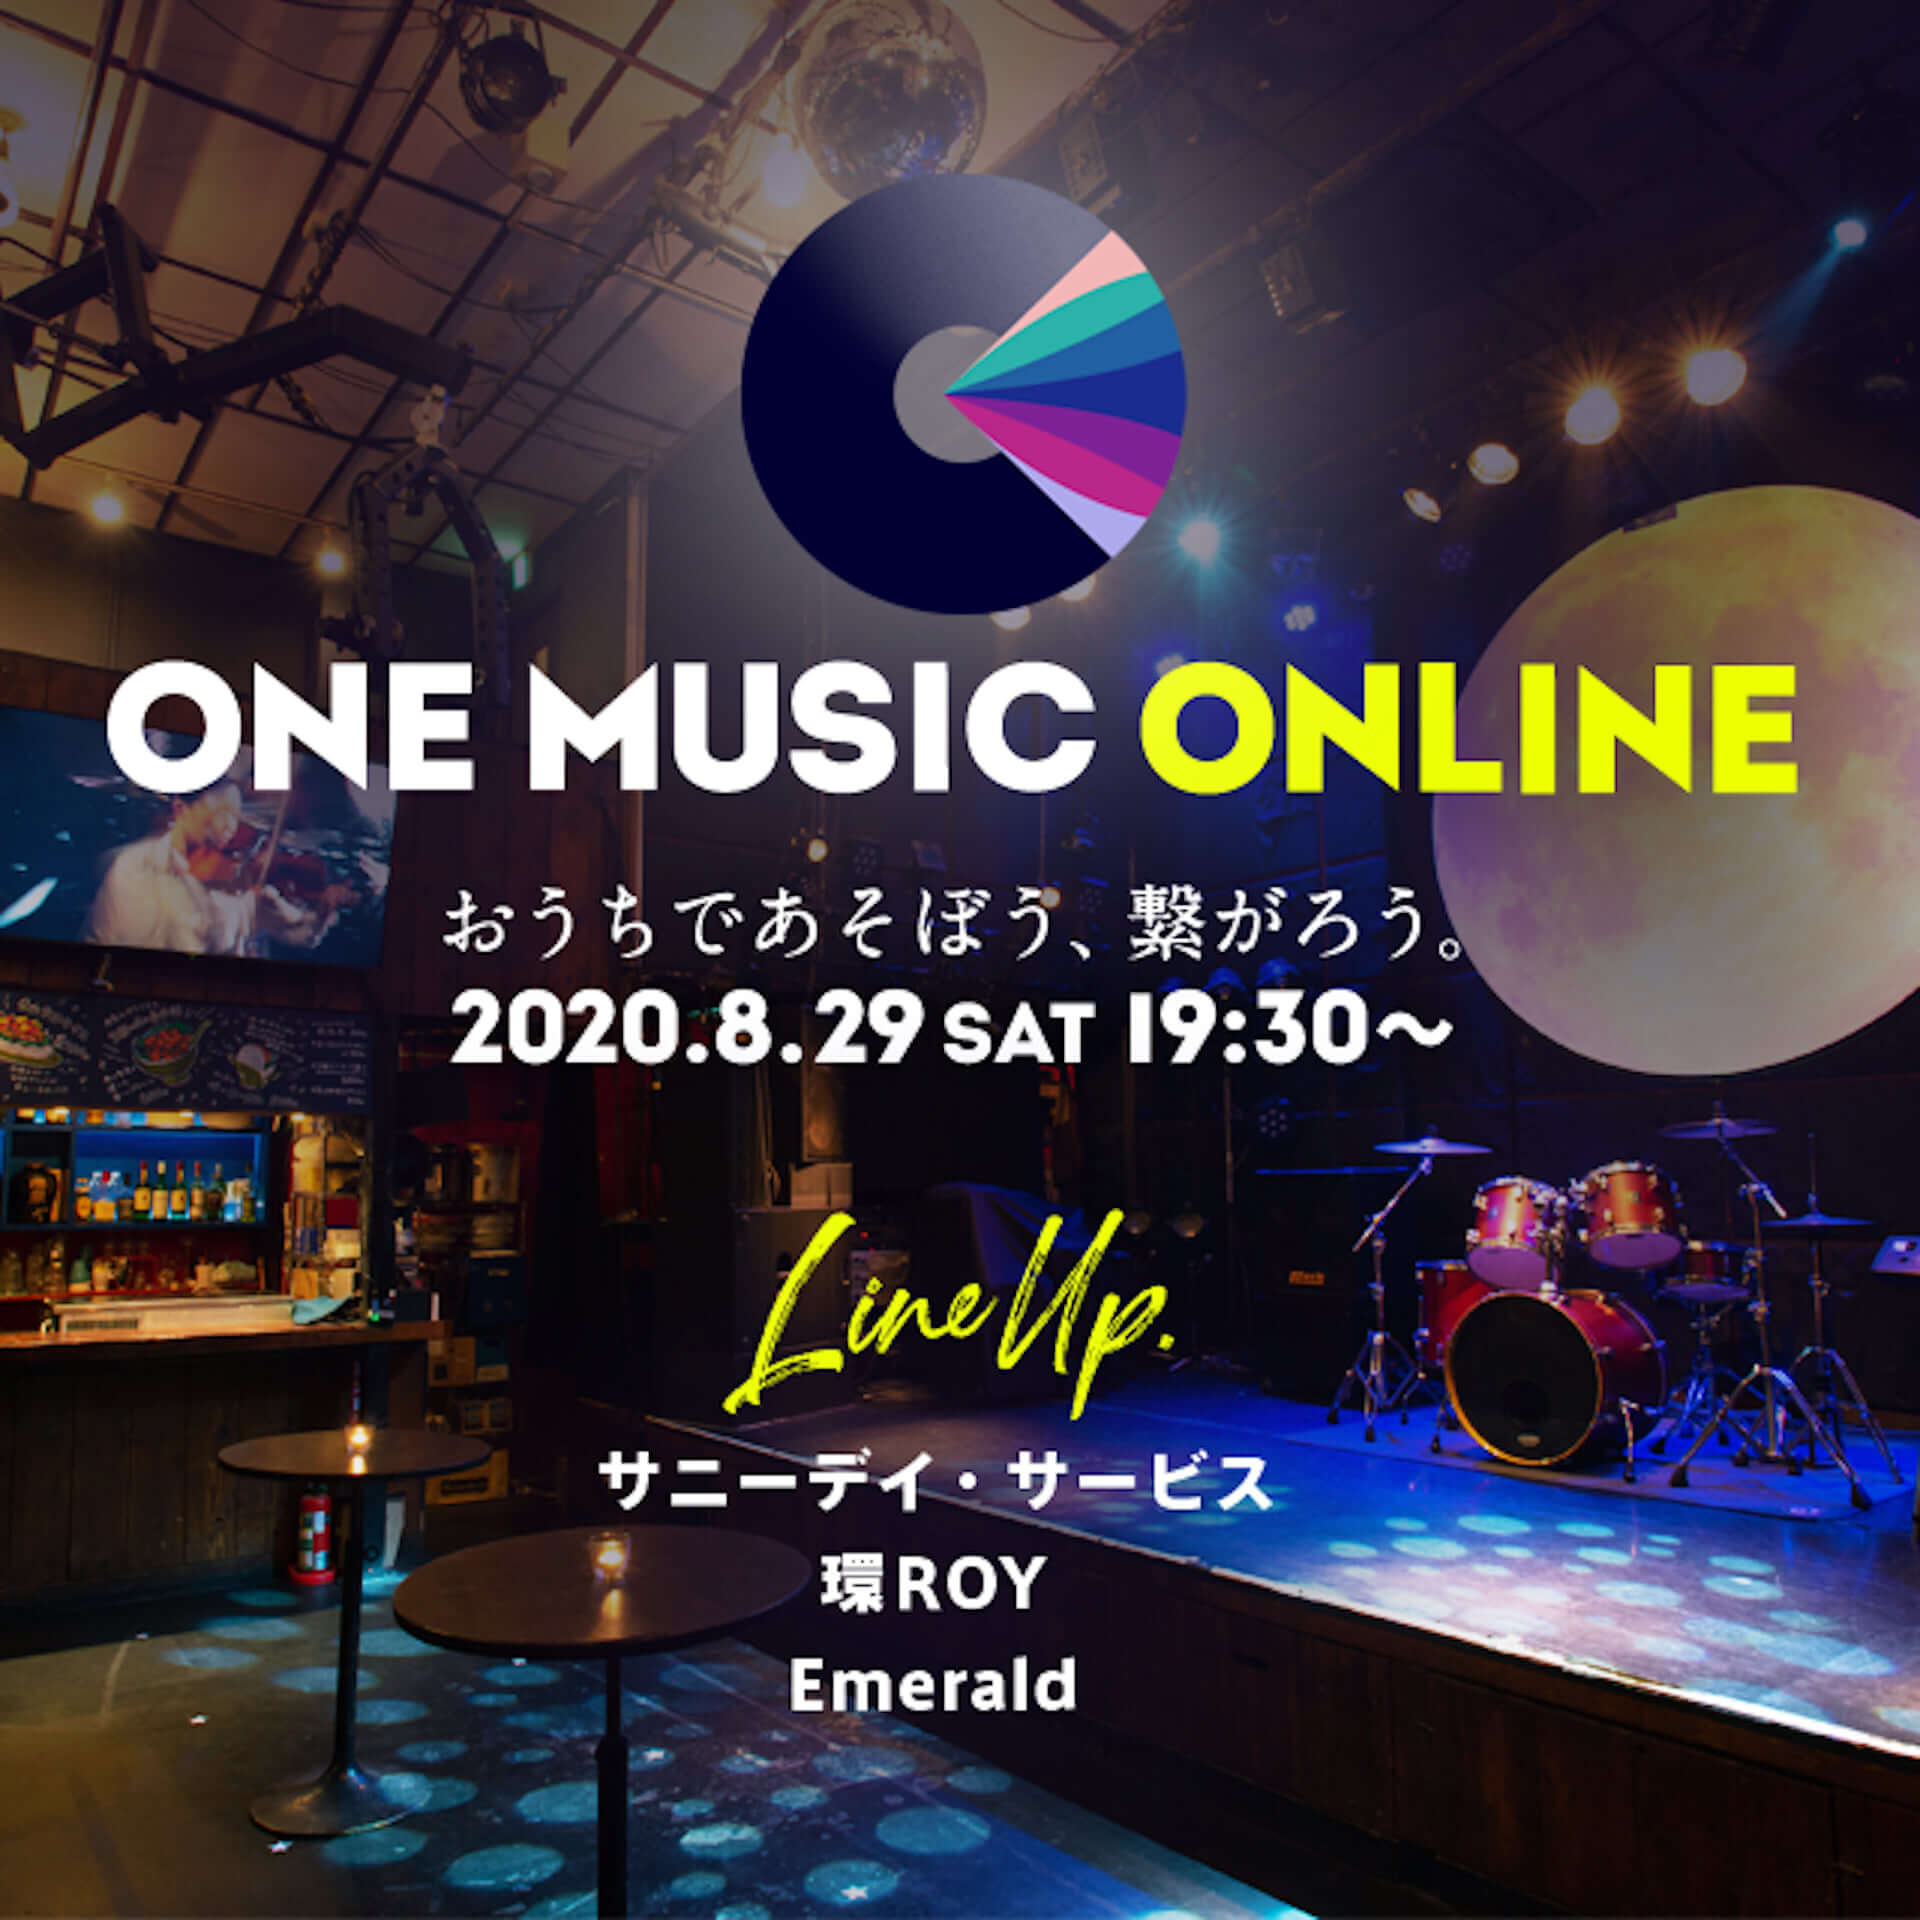 <ONE MUSIC ONLINE>出演アーティストが決定!サニーデイ・サービス、環ROY、Emeraldがラインナップ music200814_onemusiconline_3-1920x1920